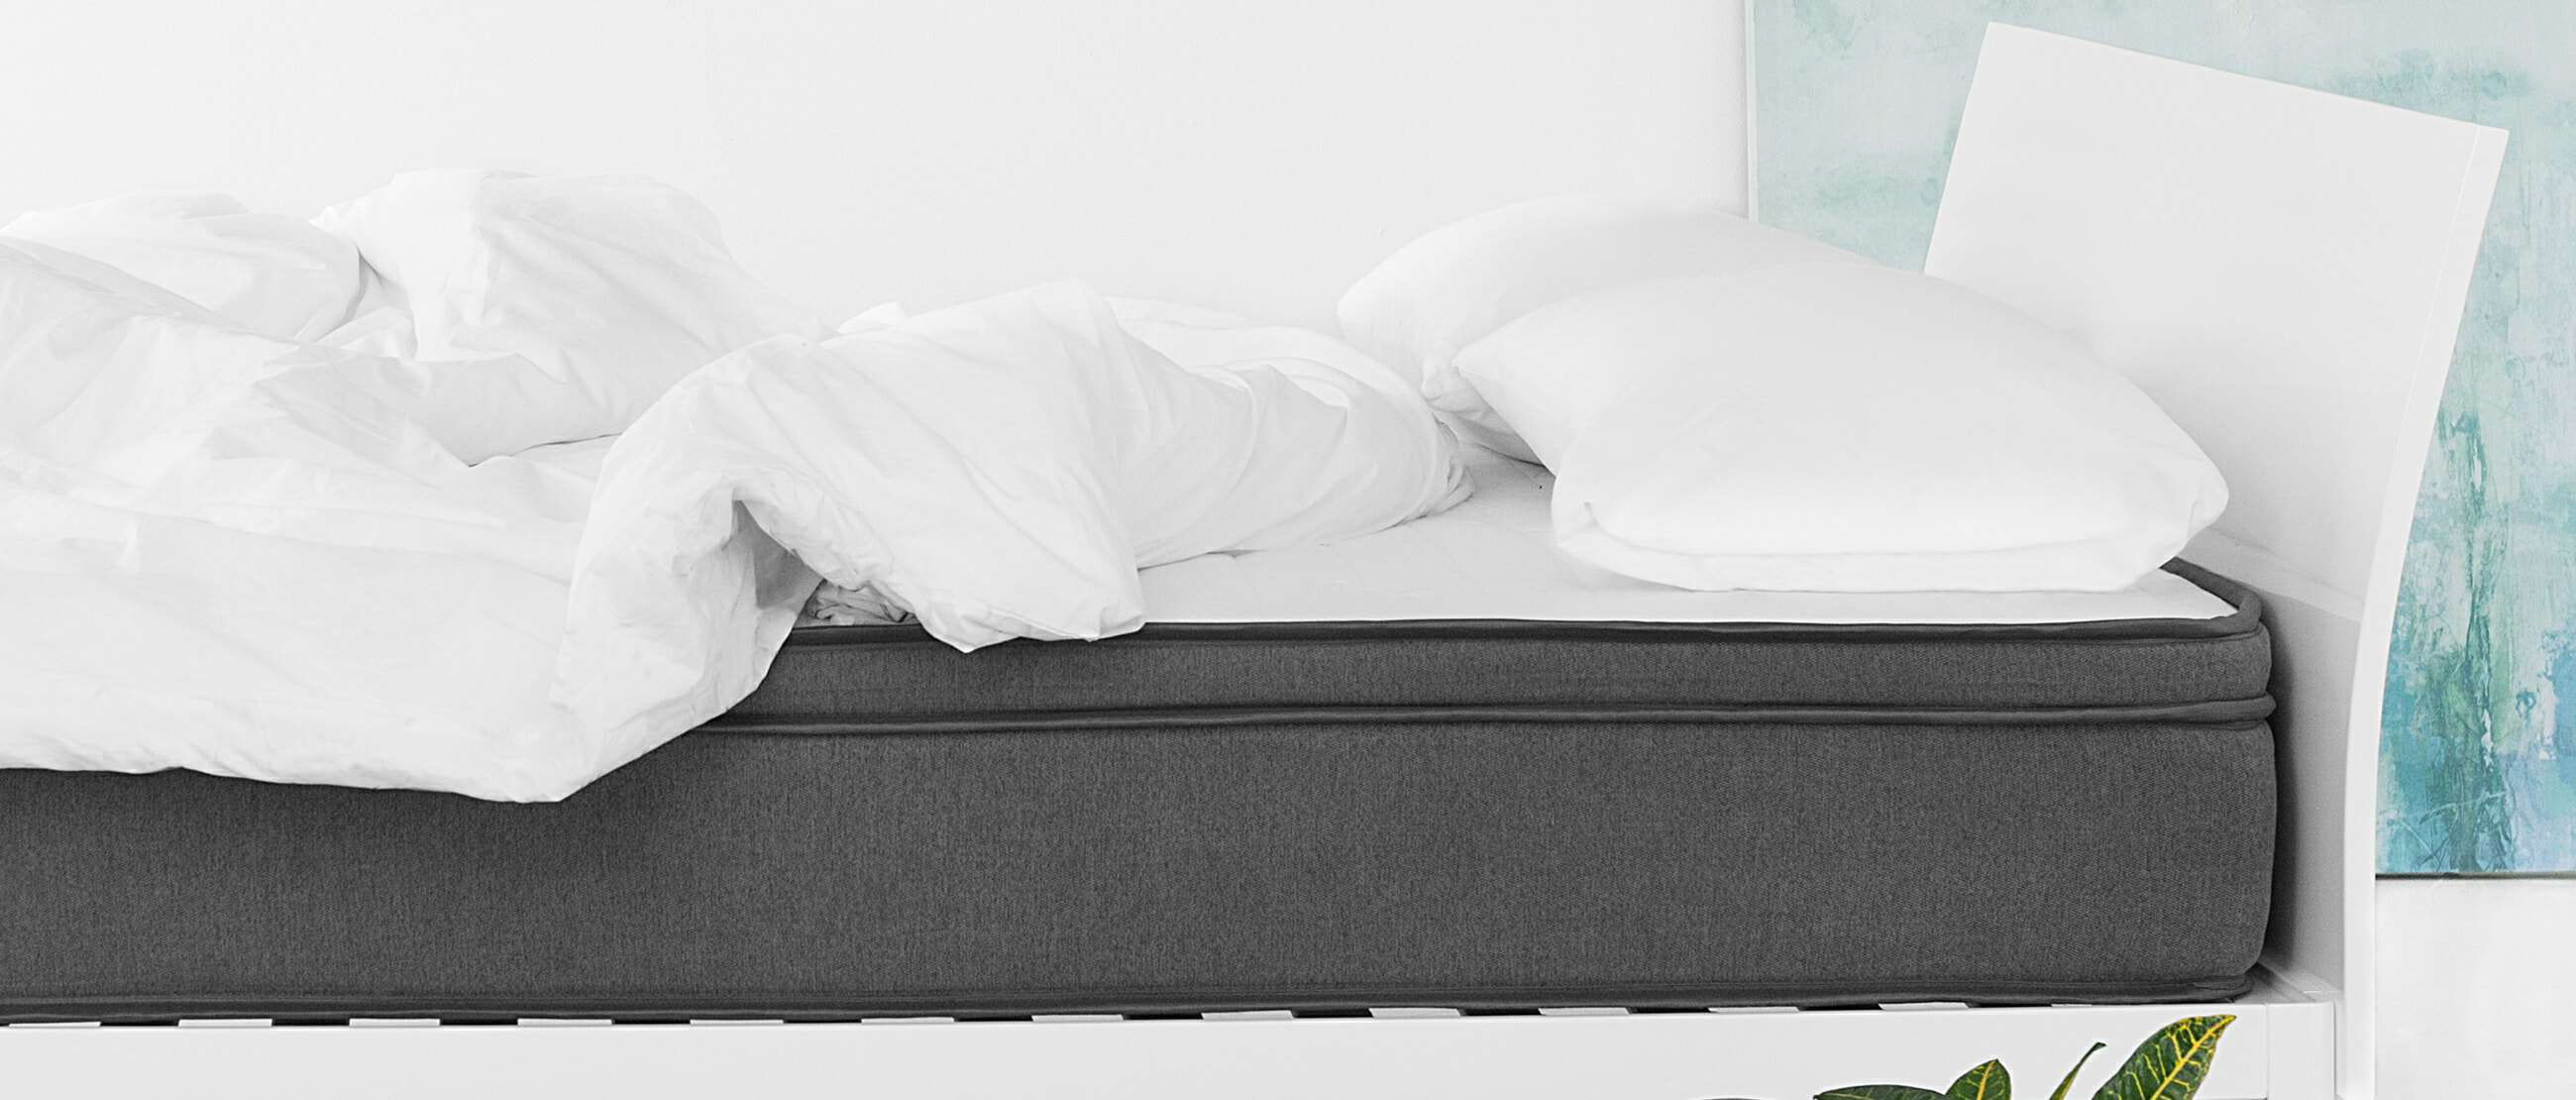 Sunrise bed